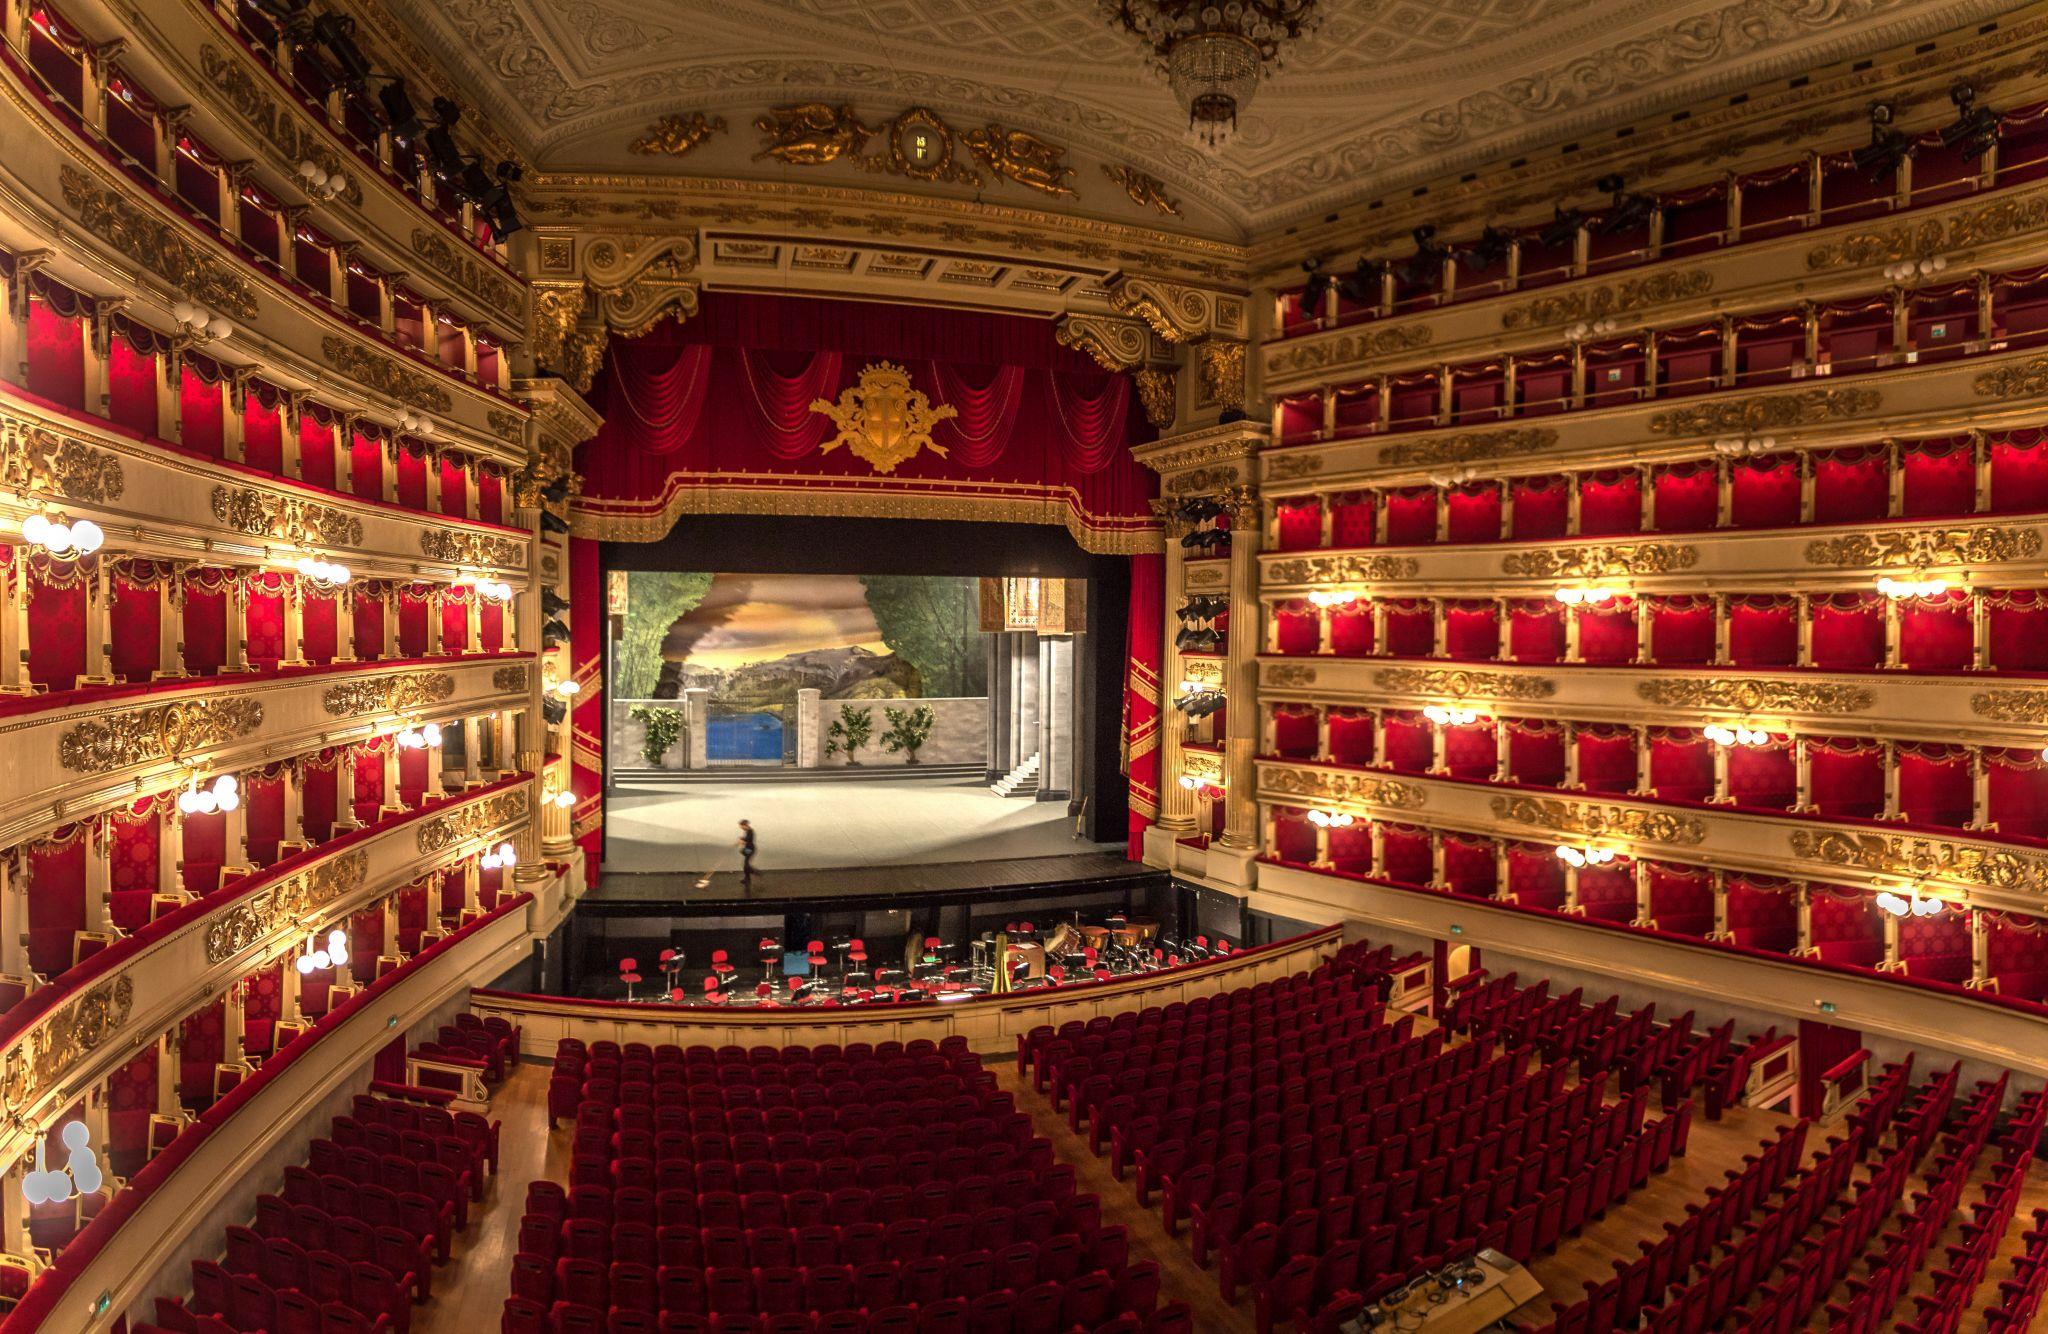 Teatro alla Scala, Italy